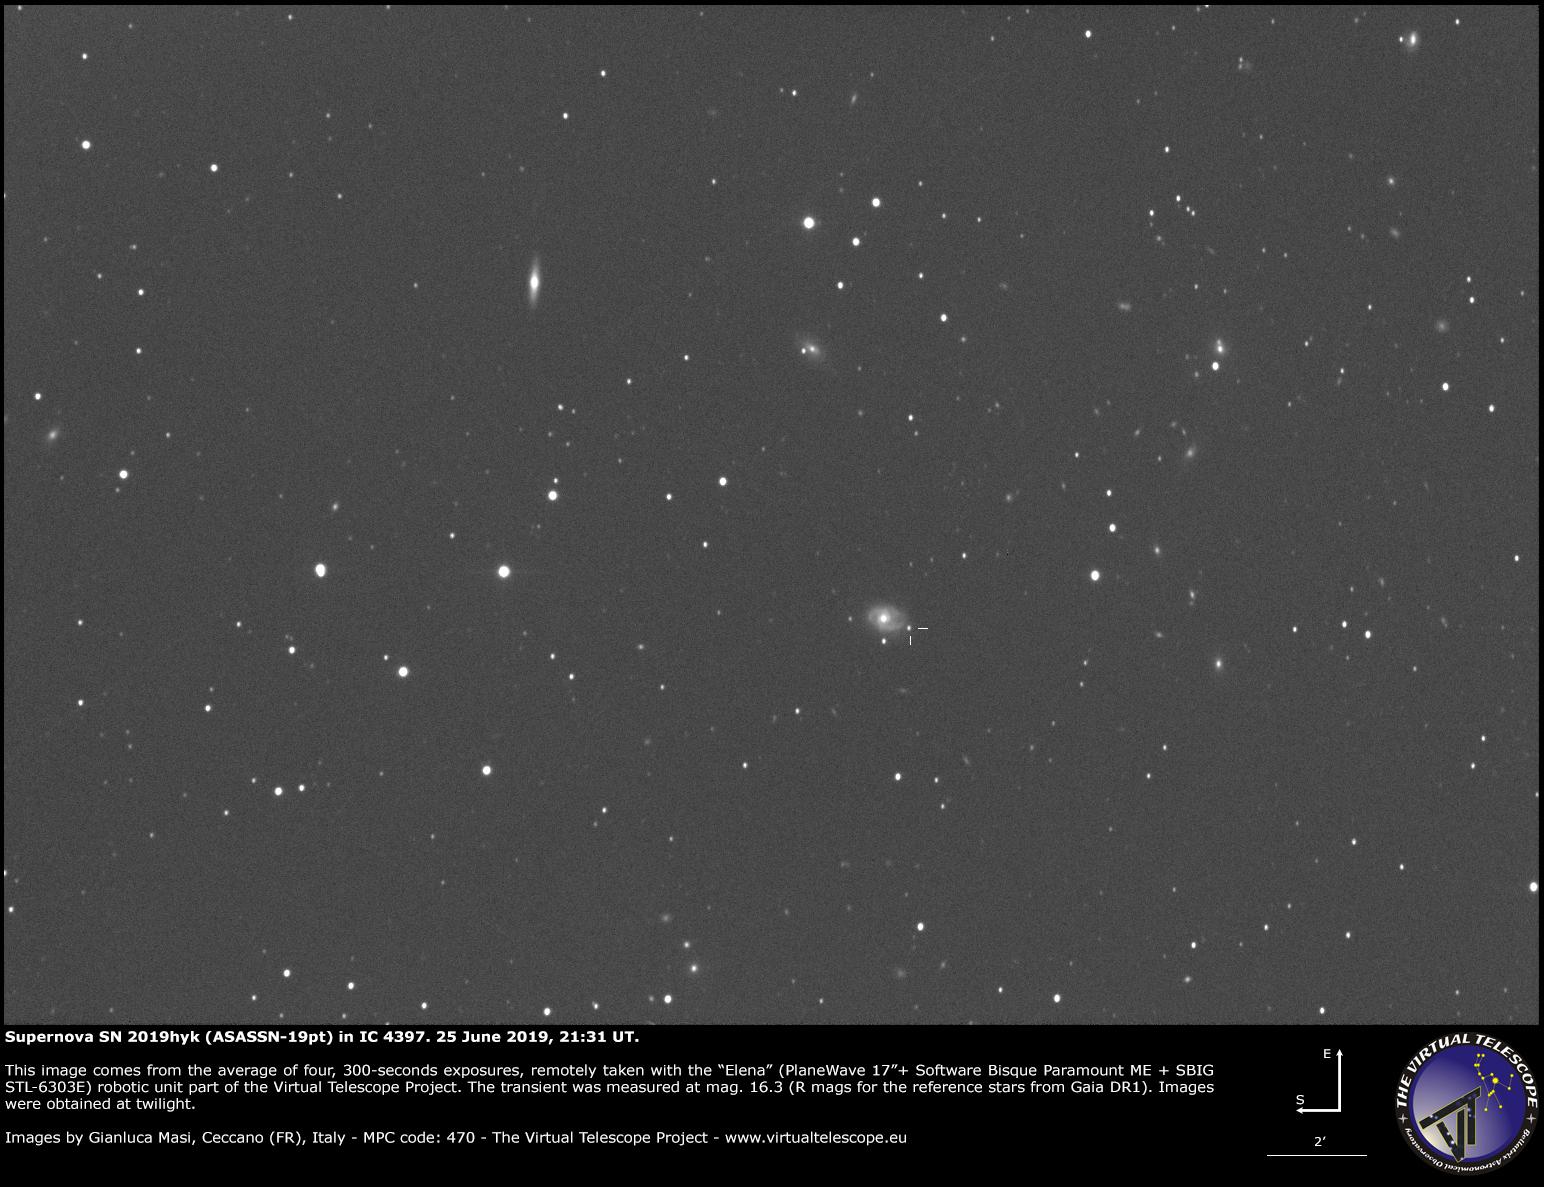 Supernova SN 2019hyk in the spiral galaxy IC 4397: 25 June 2019